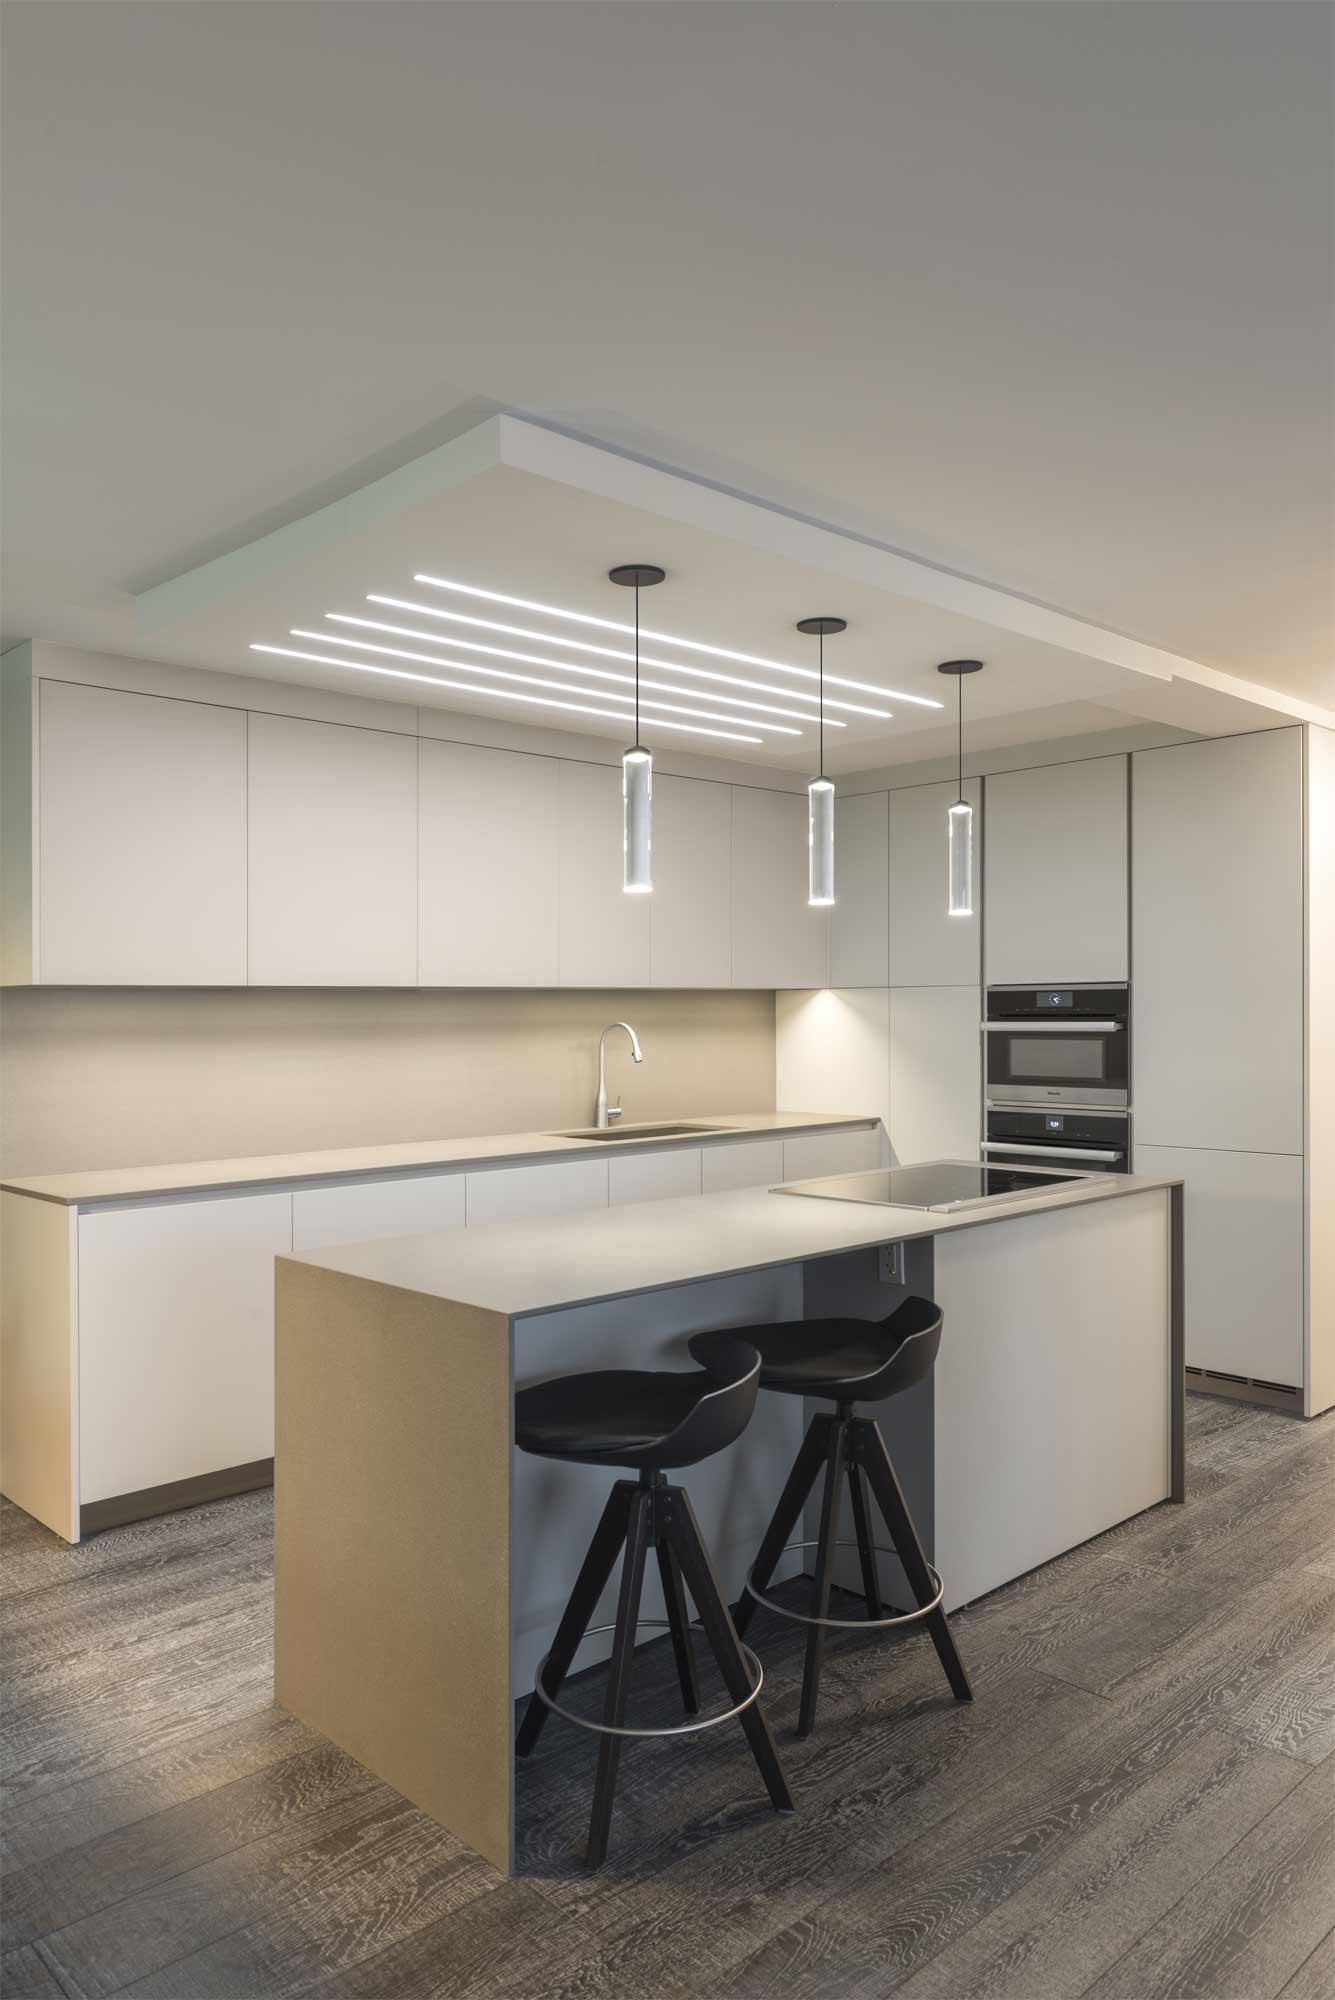 TruLine .5A 5W 24VDC Plaster-In LED System by PureEdge Lighting TruLine .5A 5W 24VDC Plaster-In LED System by PureEdge Lighting [a ... & Installation Gallery | Kitchen Lighting | Ceiling Lighting azcodes.com